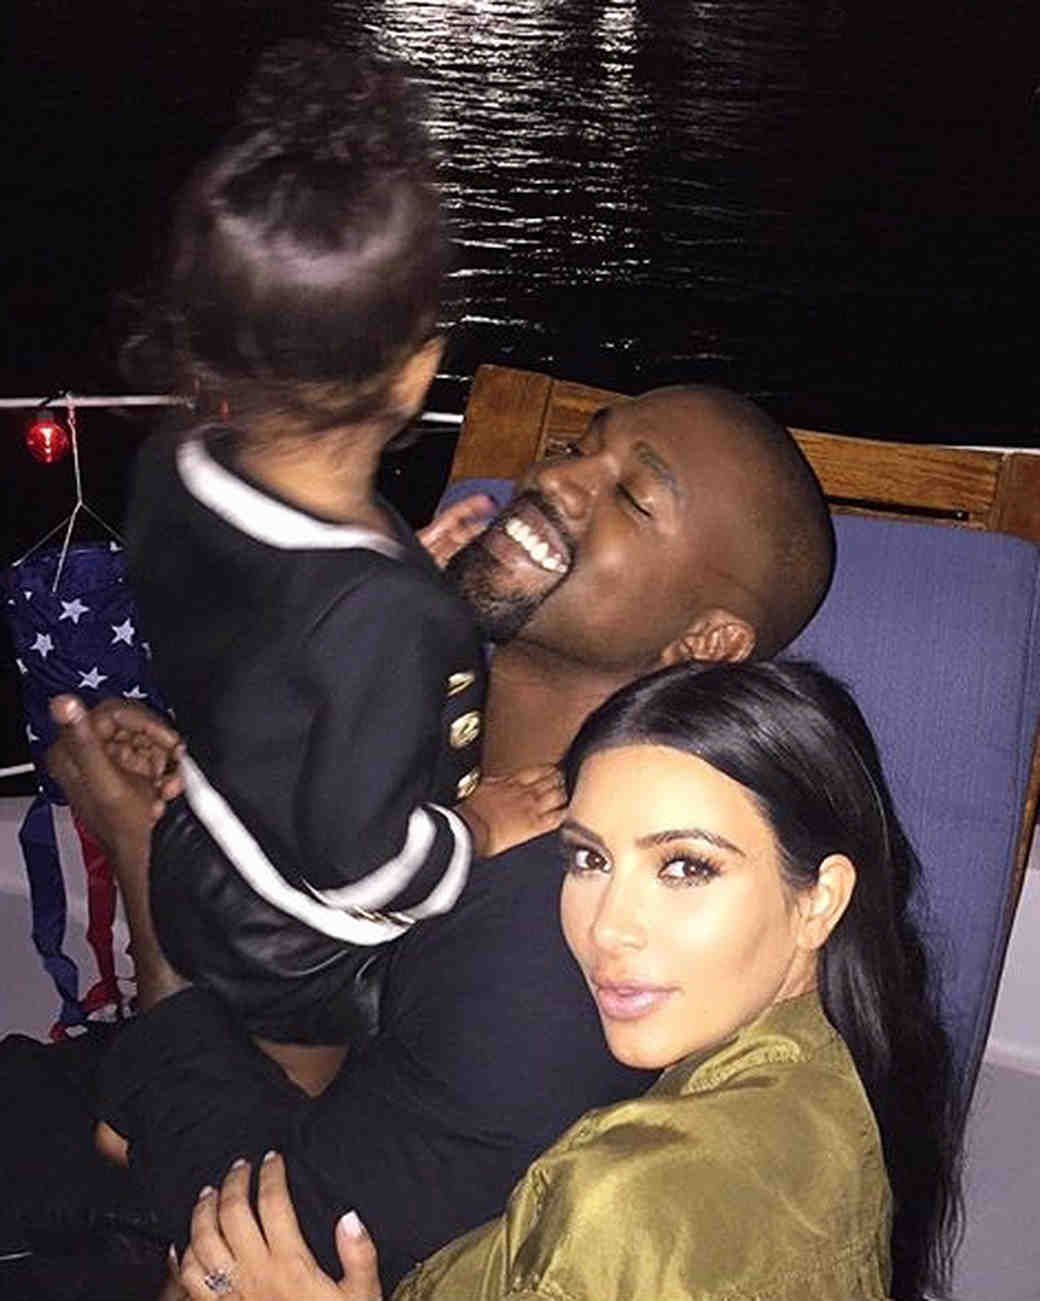 kim-kardashian-kanye-west-north-fourth-of-july-05.jpg